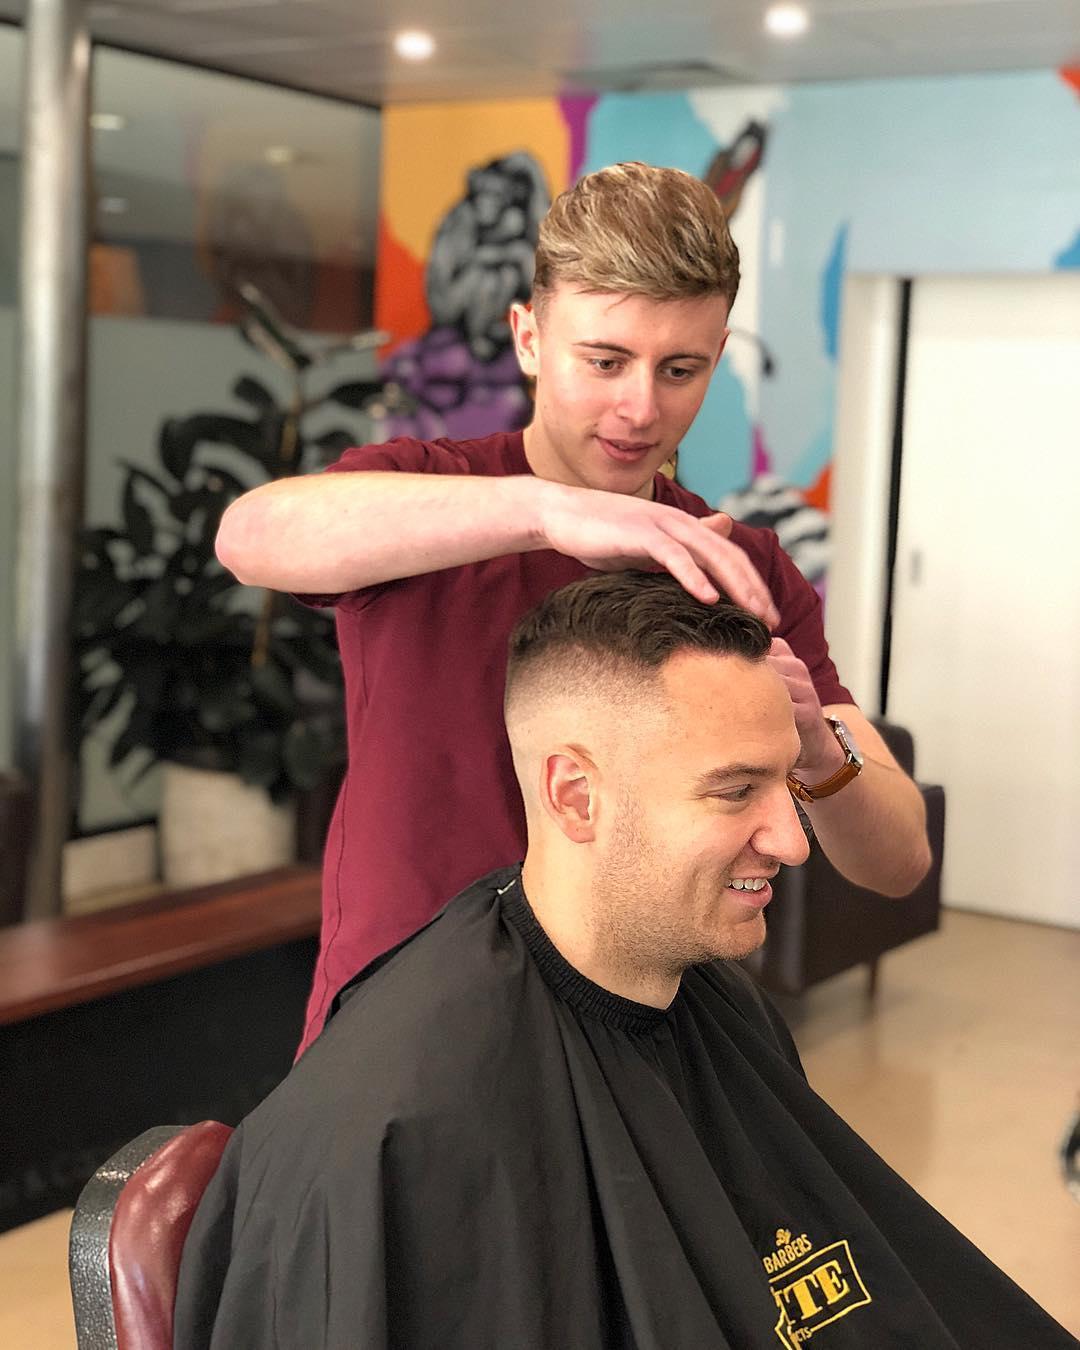 cool_dude_trimming_hair.jpg